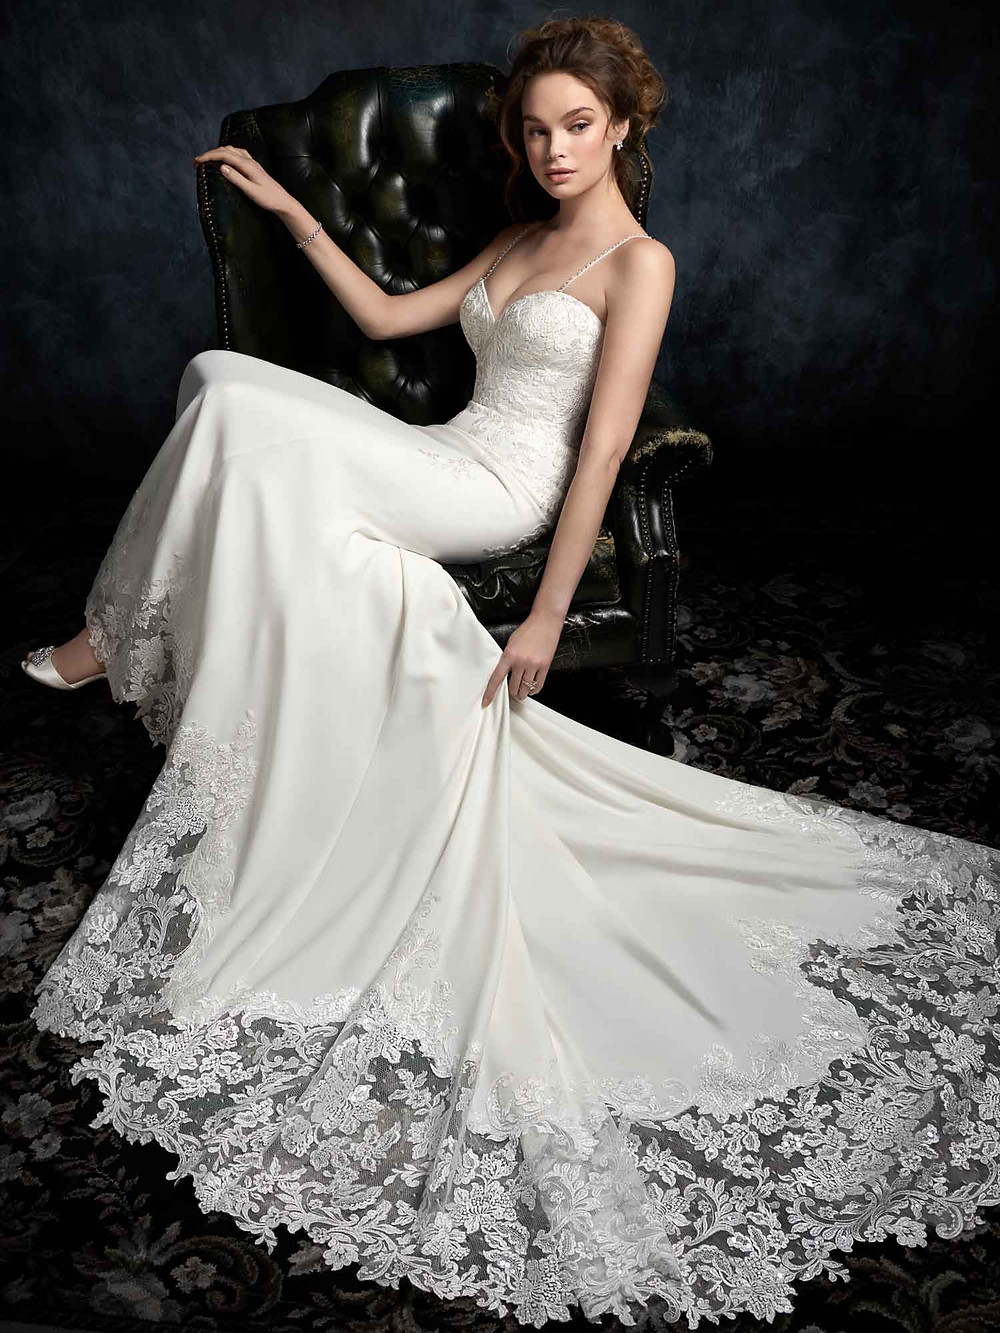 summer wedding dress in crepe